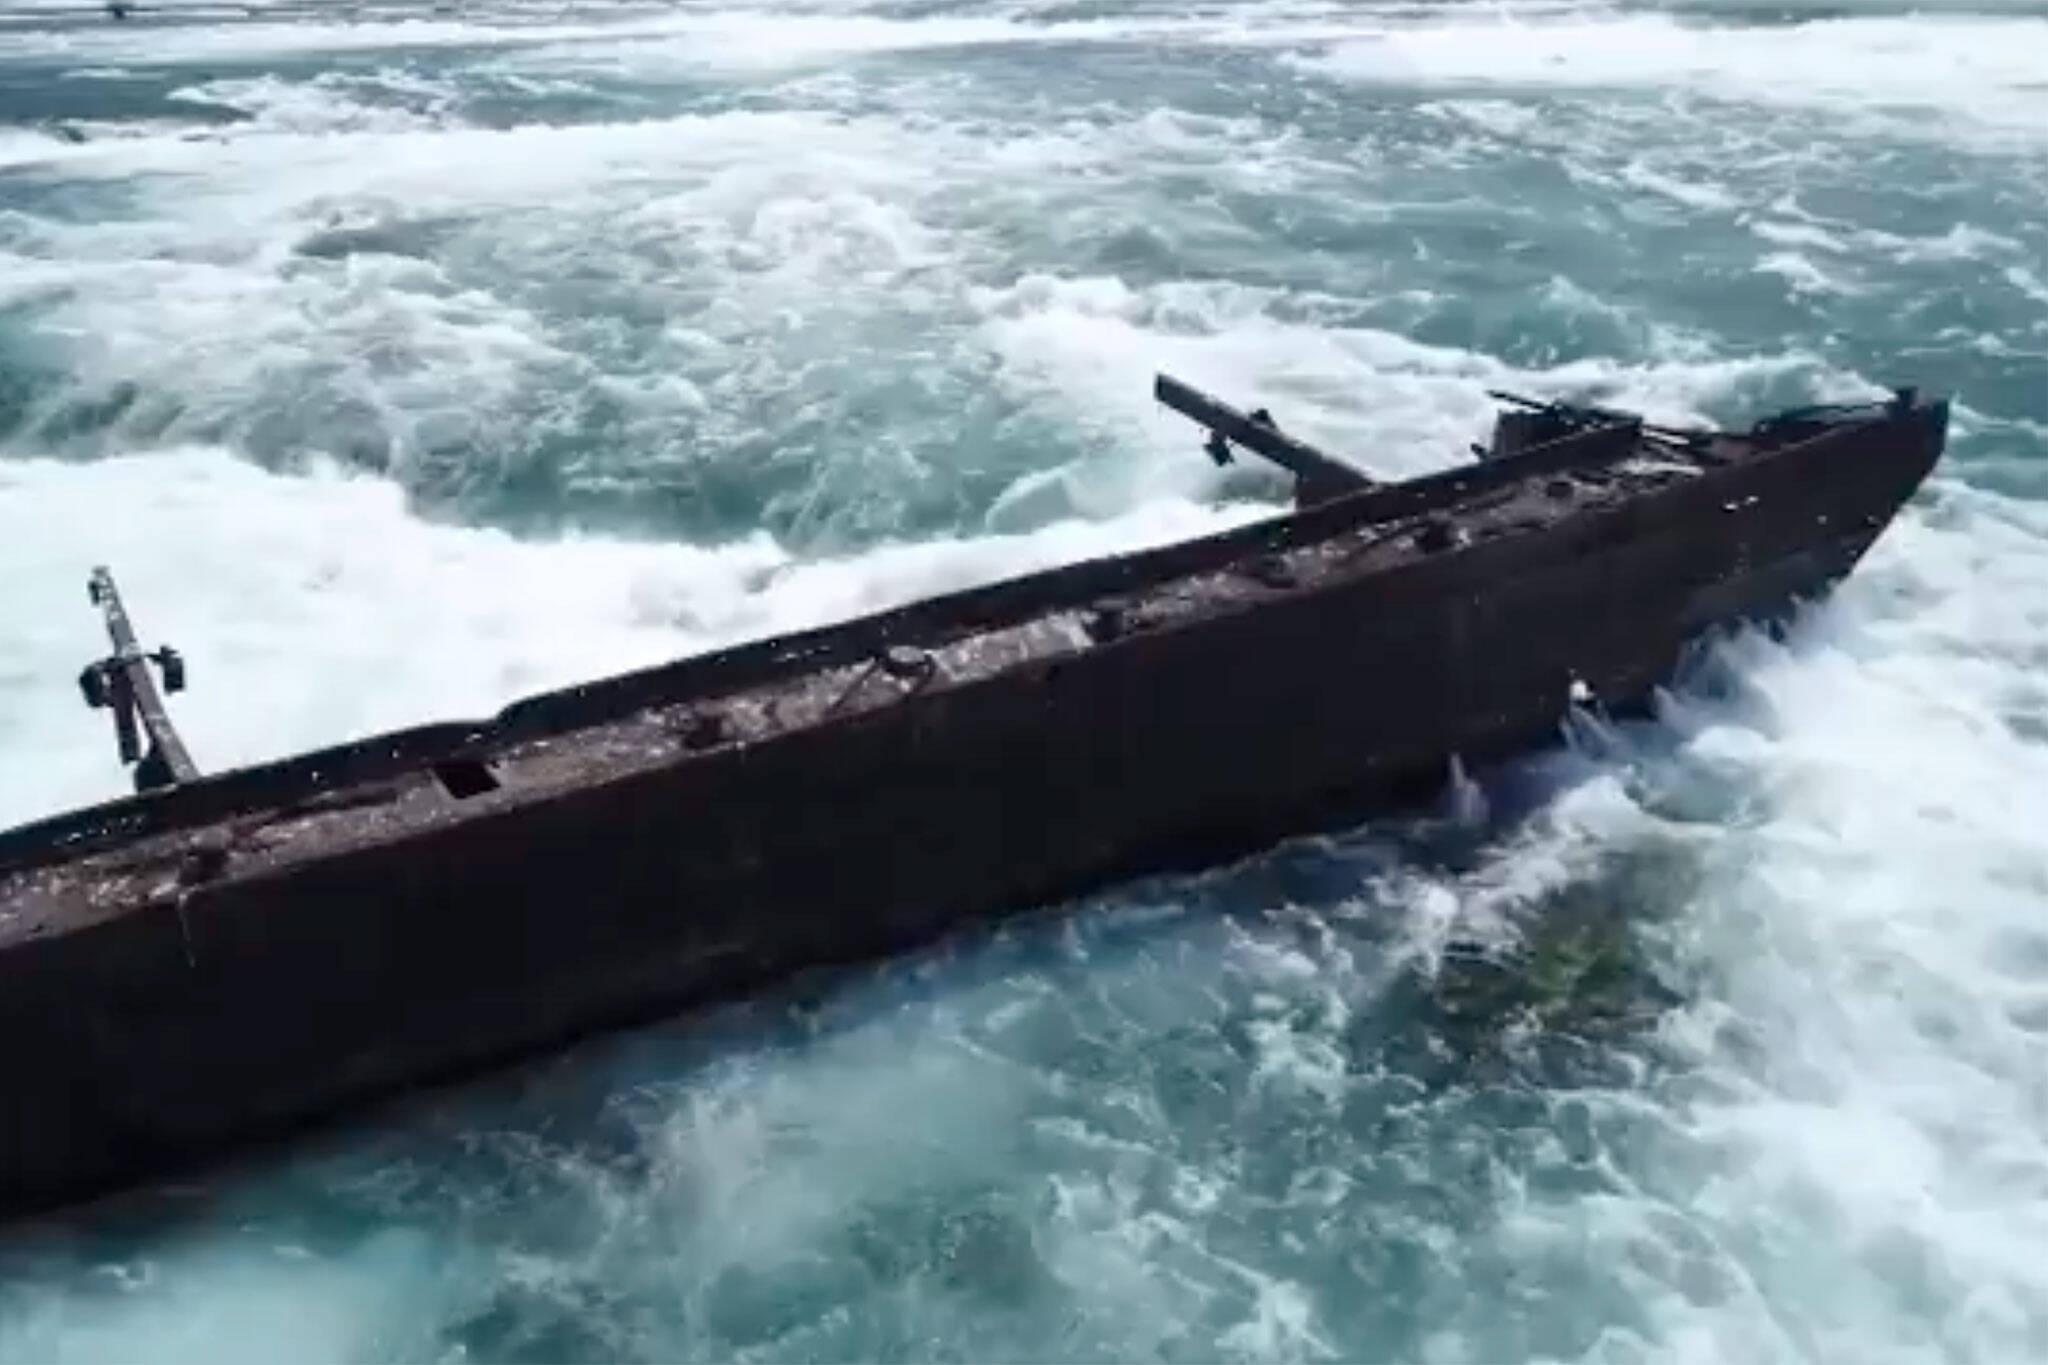 niagara falls barge